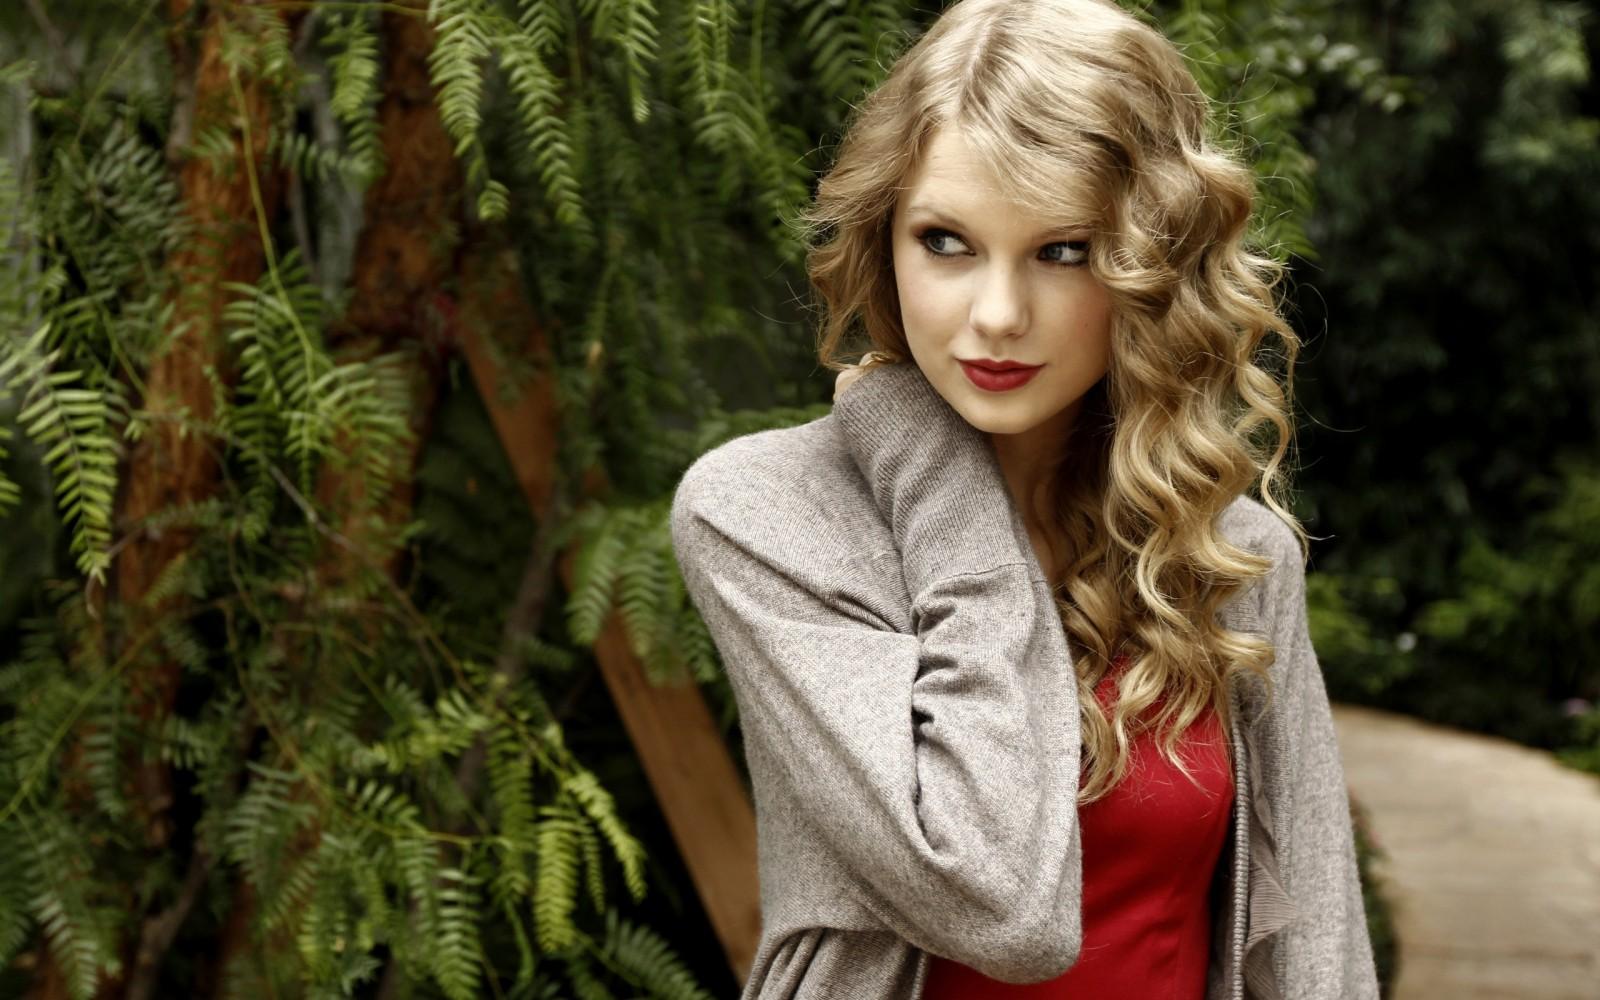 Wallpaperspoints Taylor Swift 2013 wallpaper Full HD 1600x1000